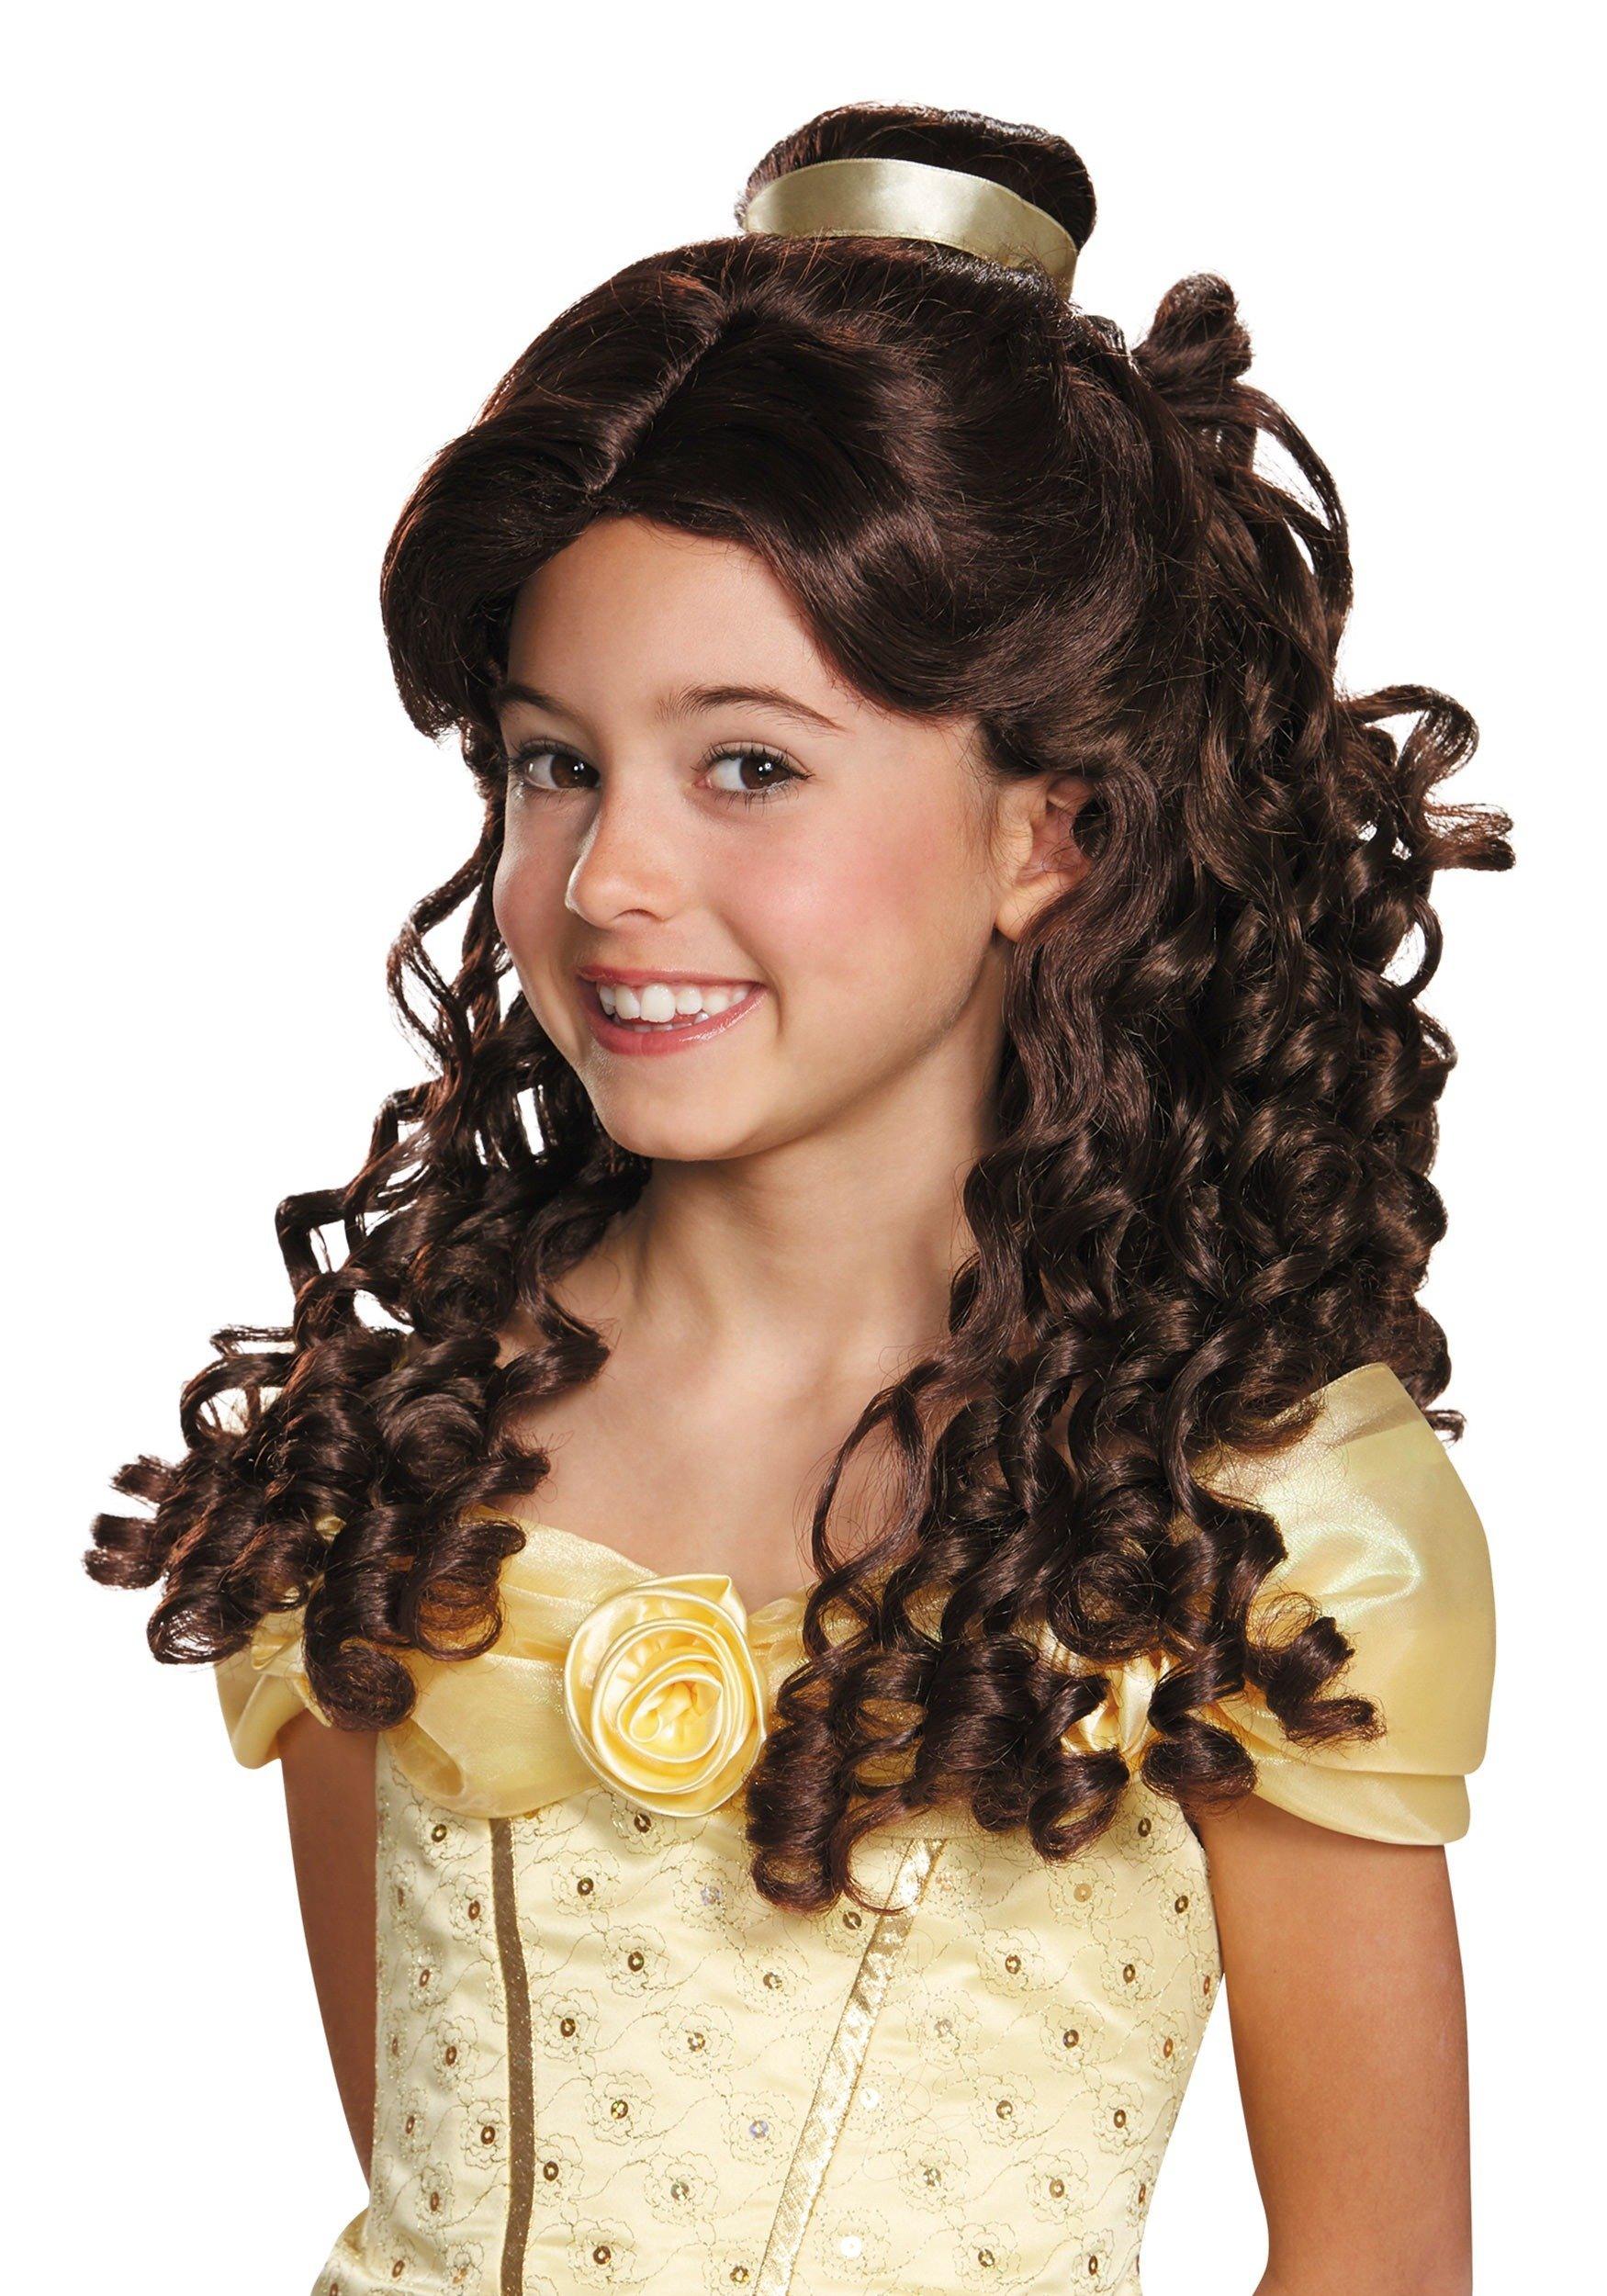 Disney Princess Belle Beauty & the Beast Girls' Prestige Wig by Disguise